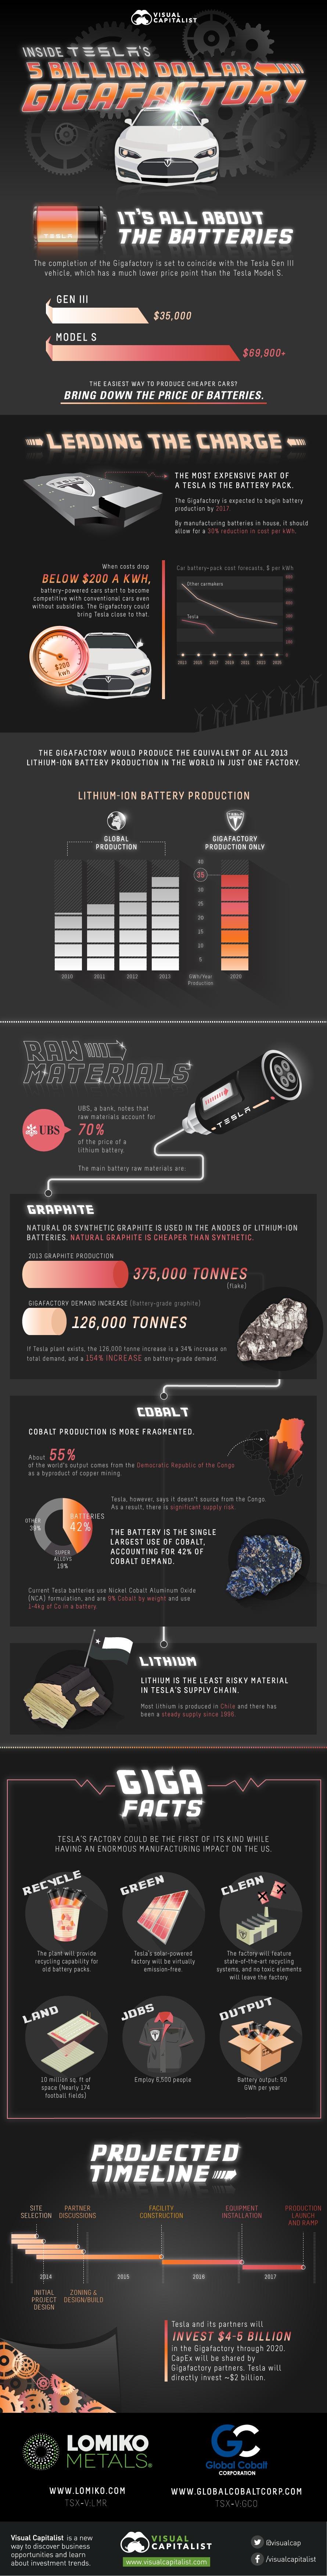 Gigafabrik-Infografik